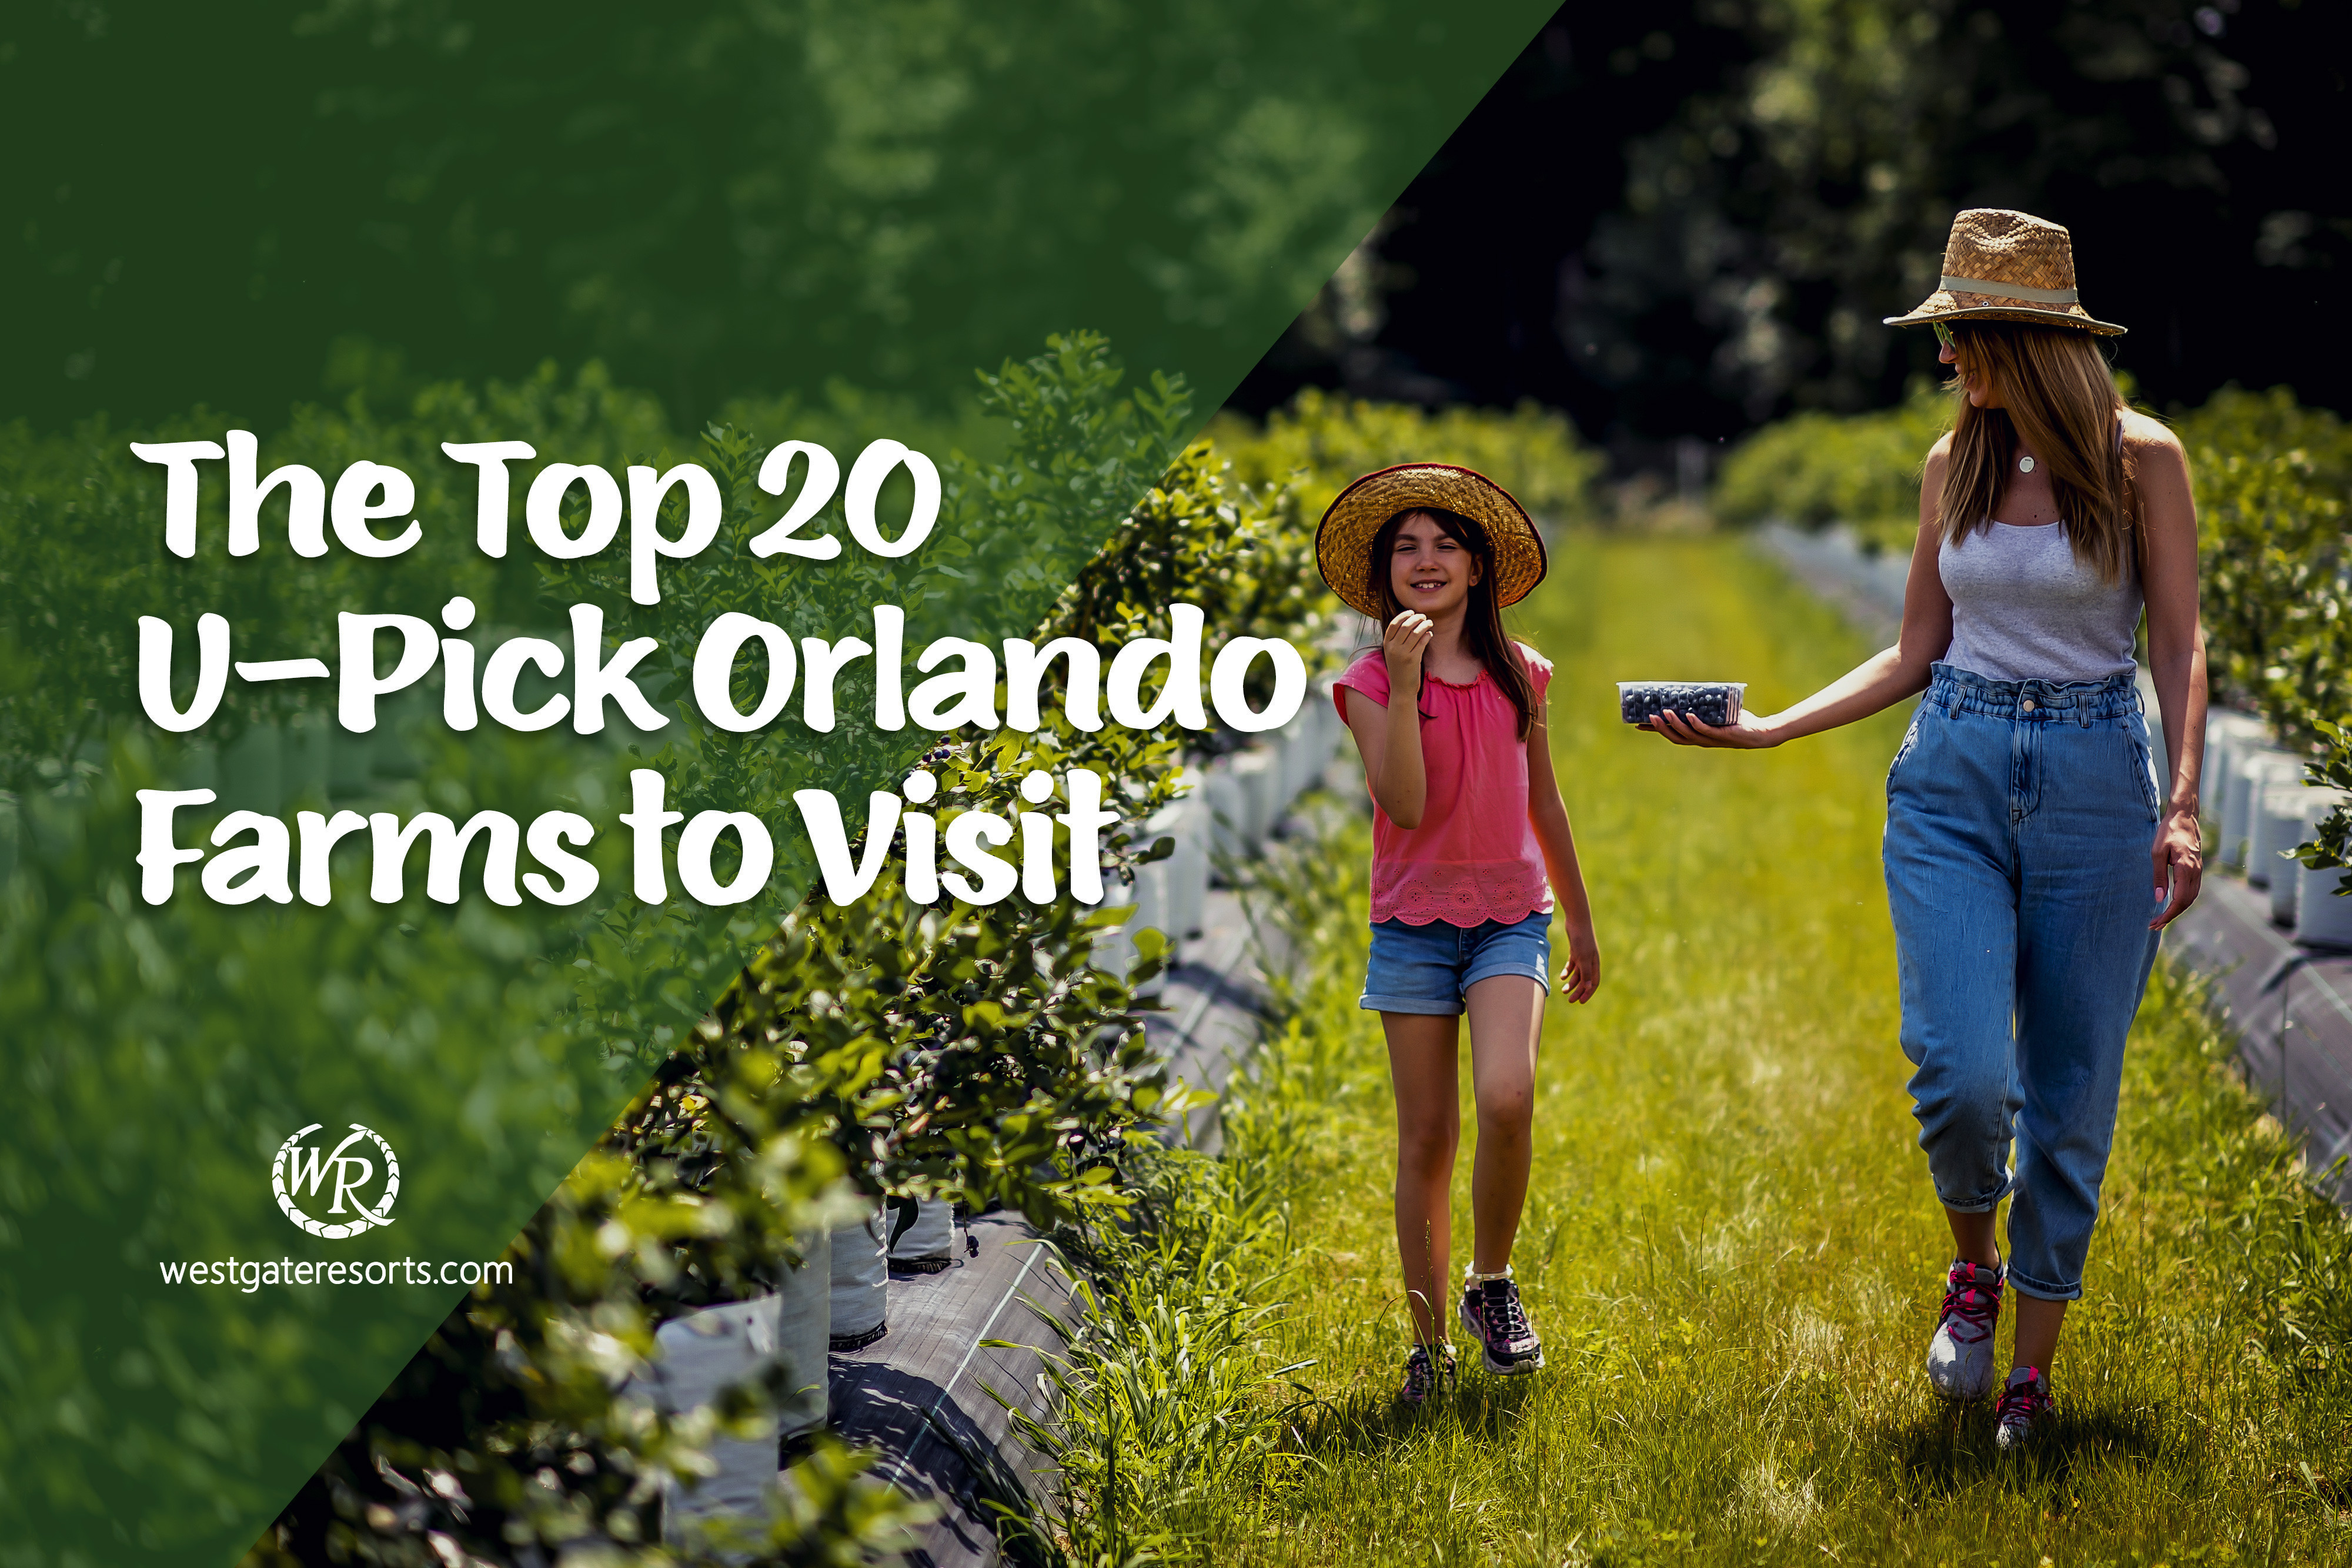 The Top 20 U Pick Orlando Farms to Visit